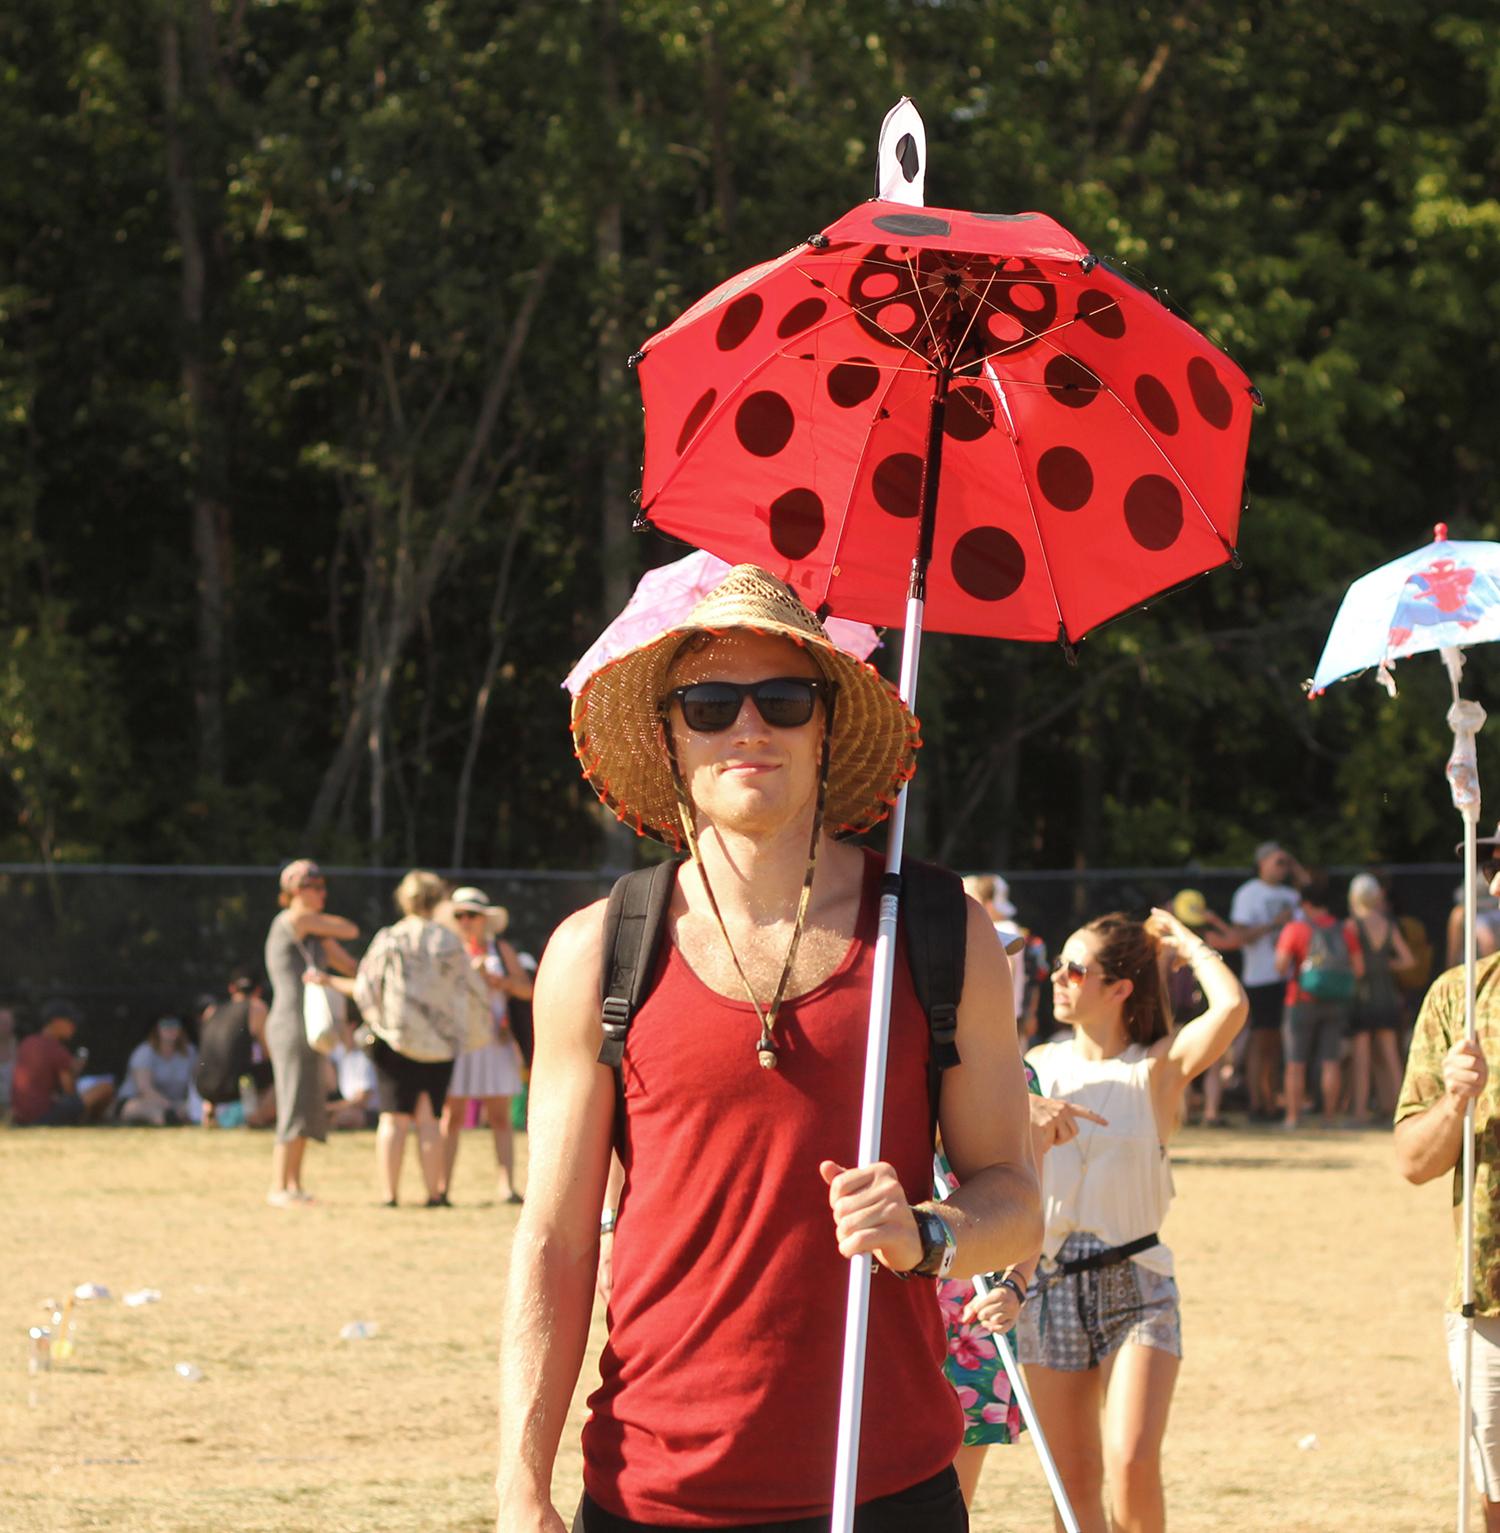 Ladybugumbrella